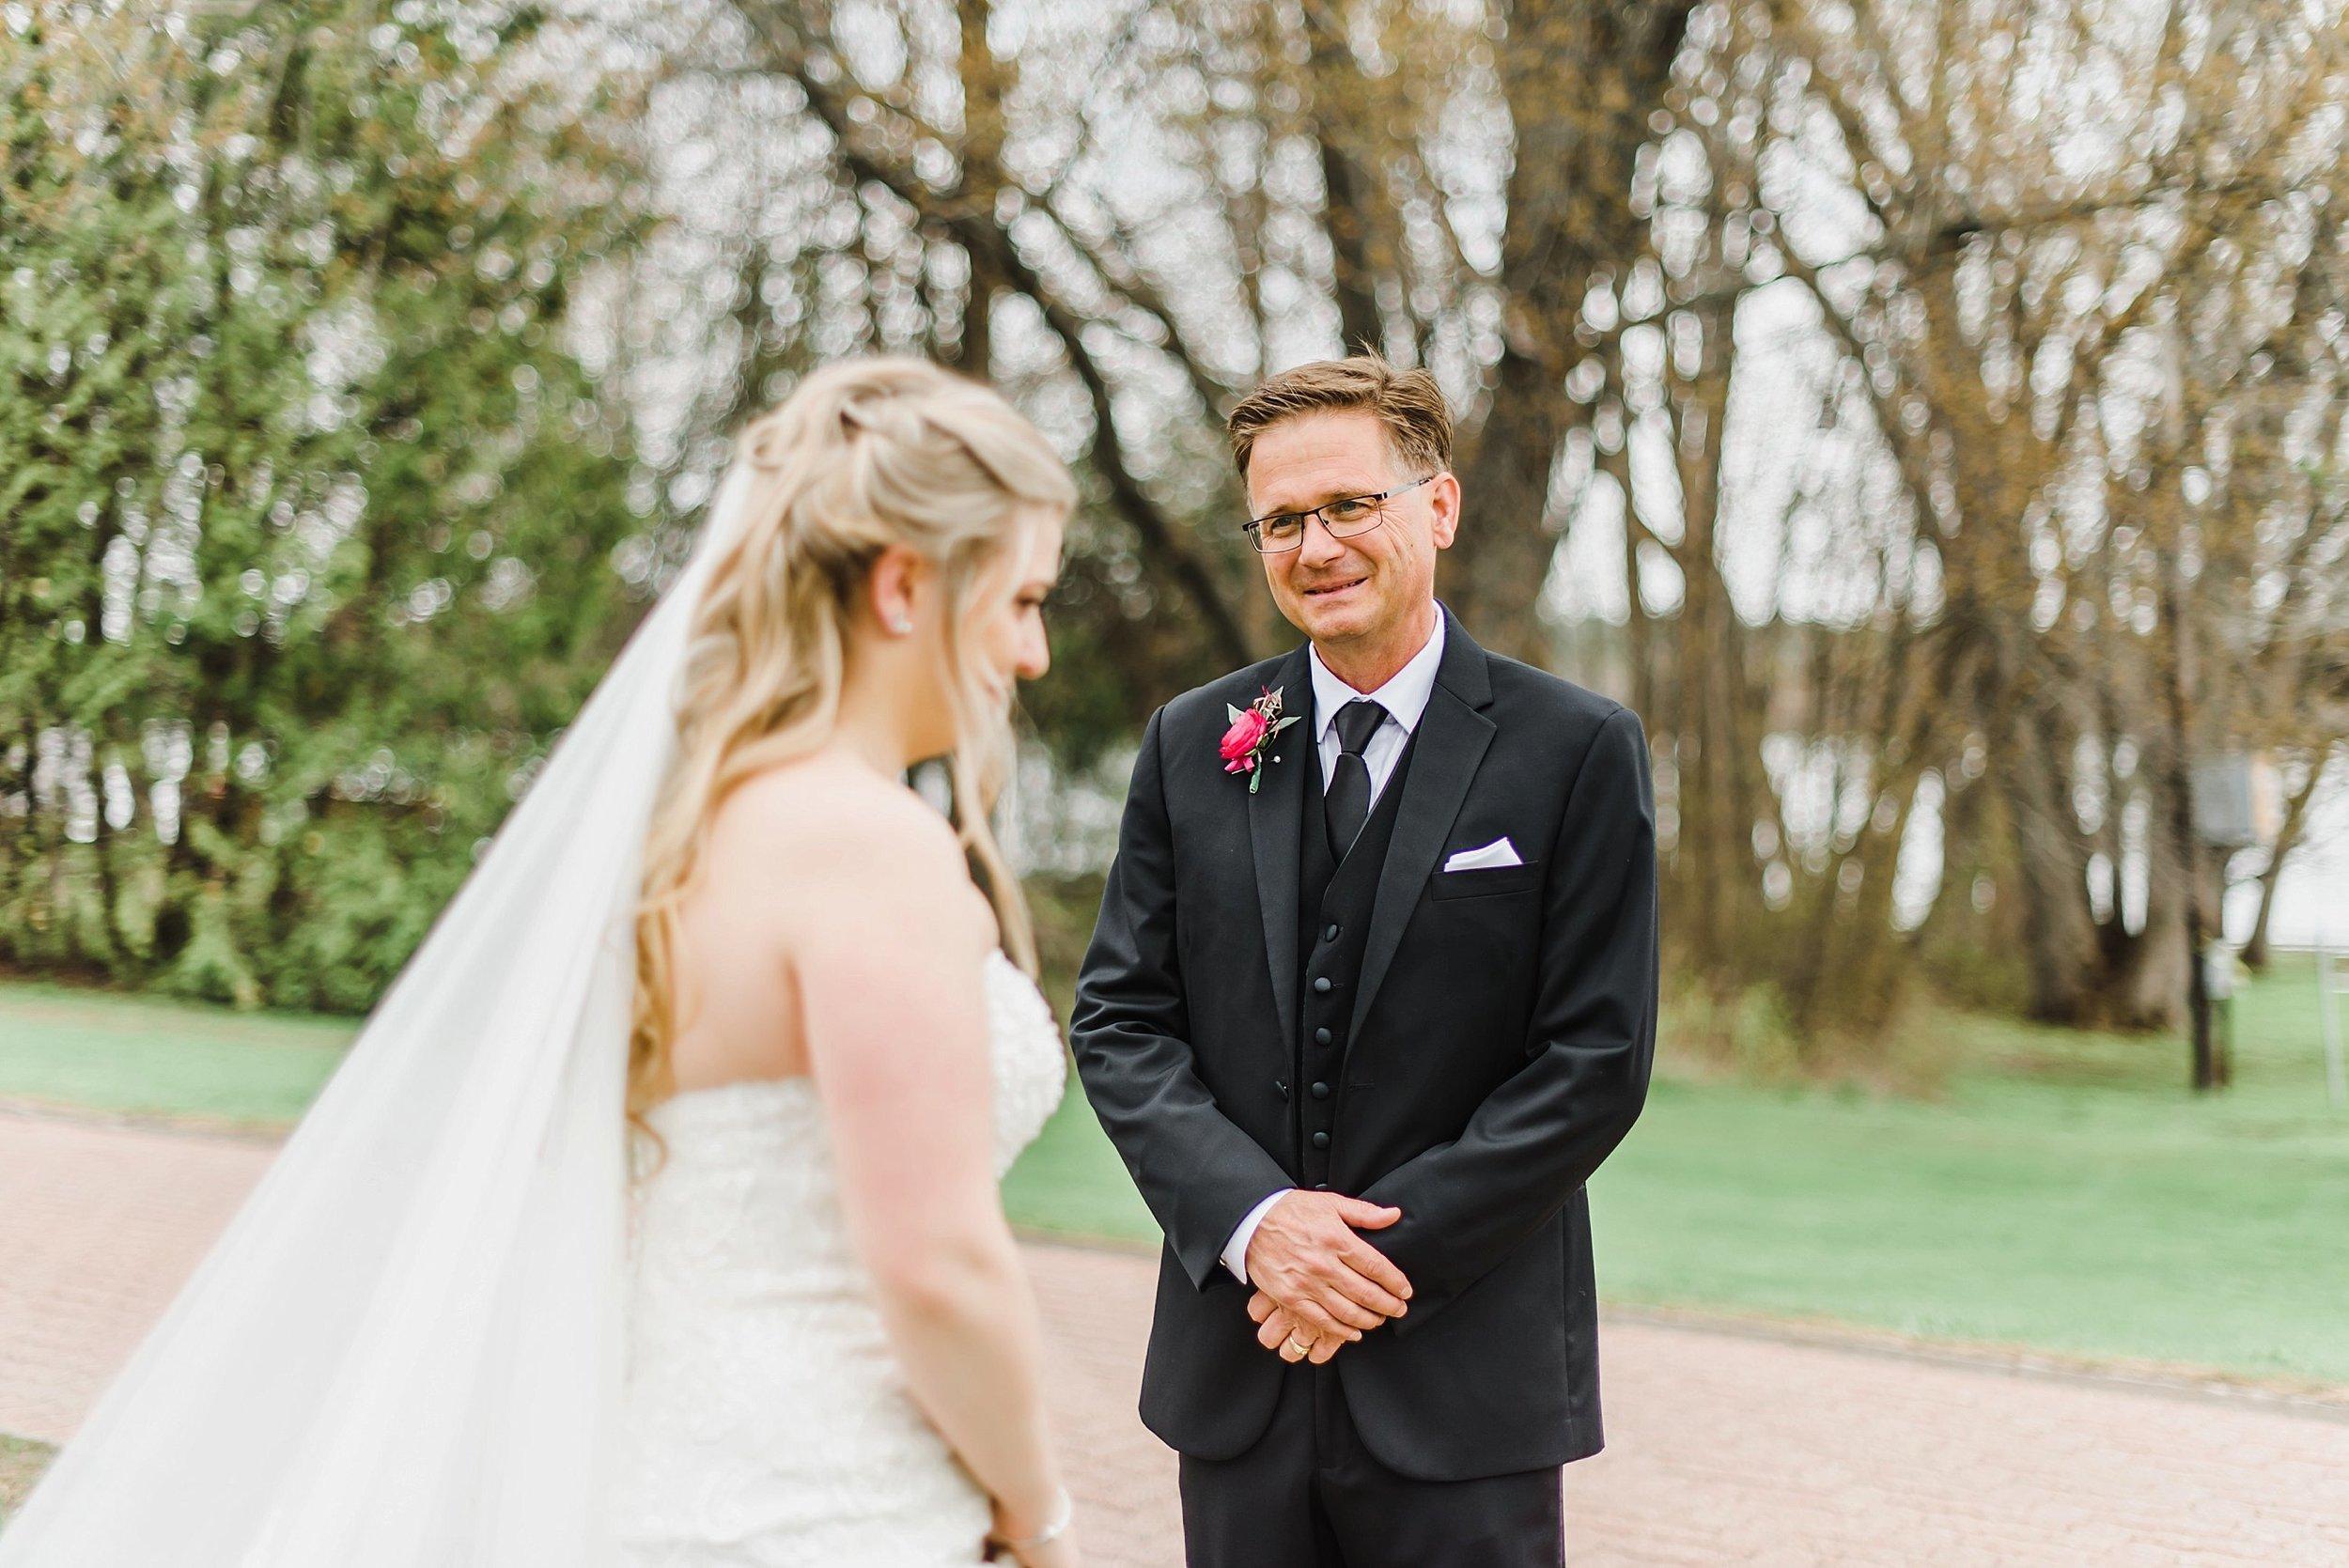 light airy indie fine art ottawa wedding photographer | Ali and Batoul Photography_0135.jpg